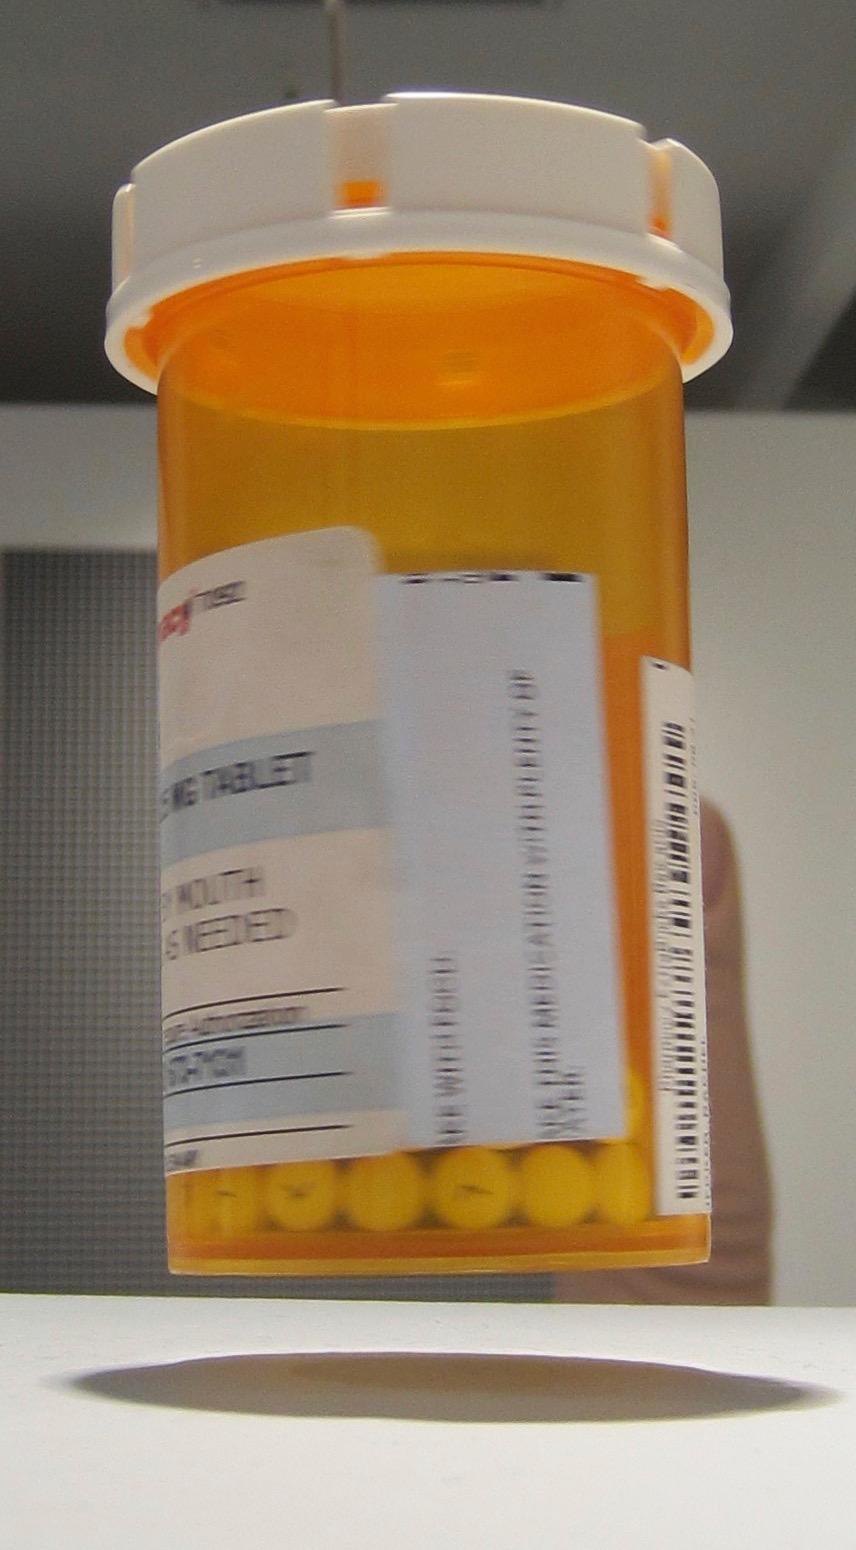 Rachel Hecker, Floating Xanax, (detail), 2013 / 2015, pill bottle, pills, magnet, electromagnet, plastic, wood, 44 x 11 x 11 inches